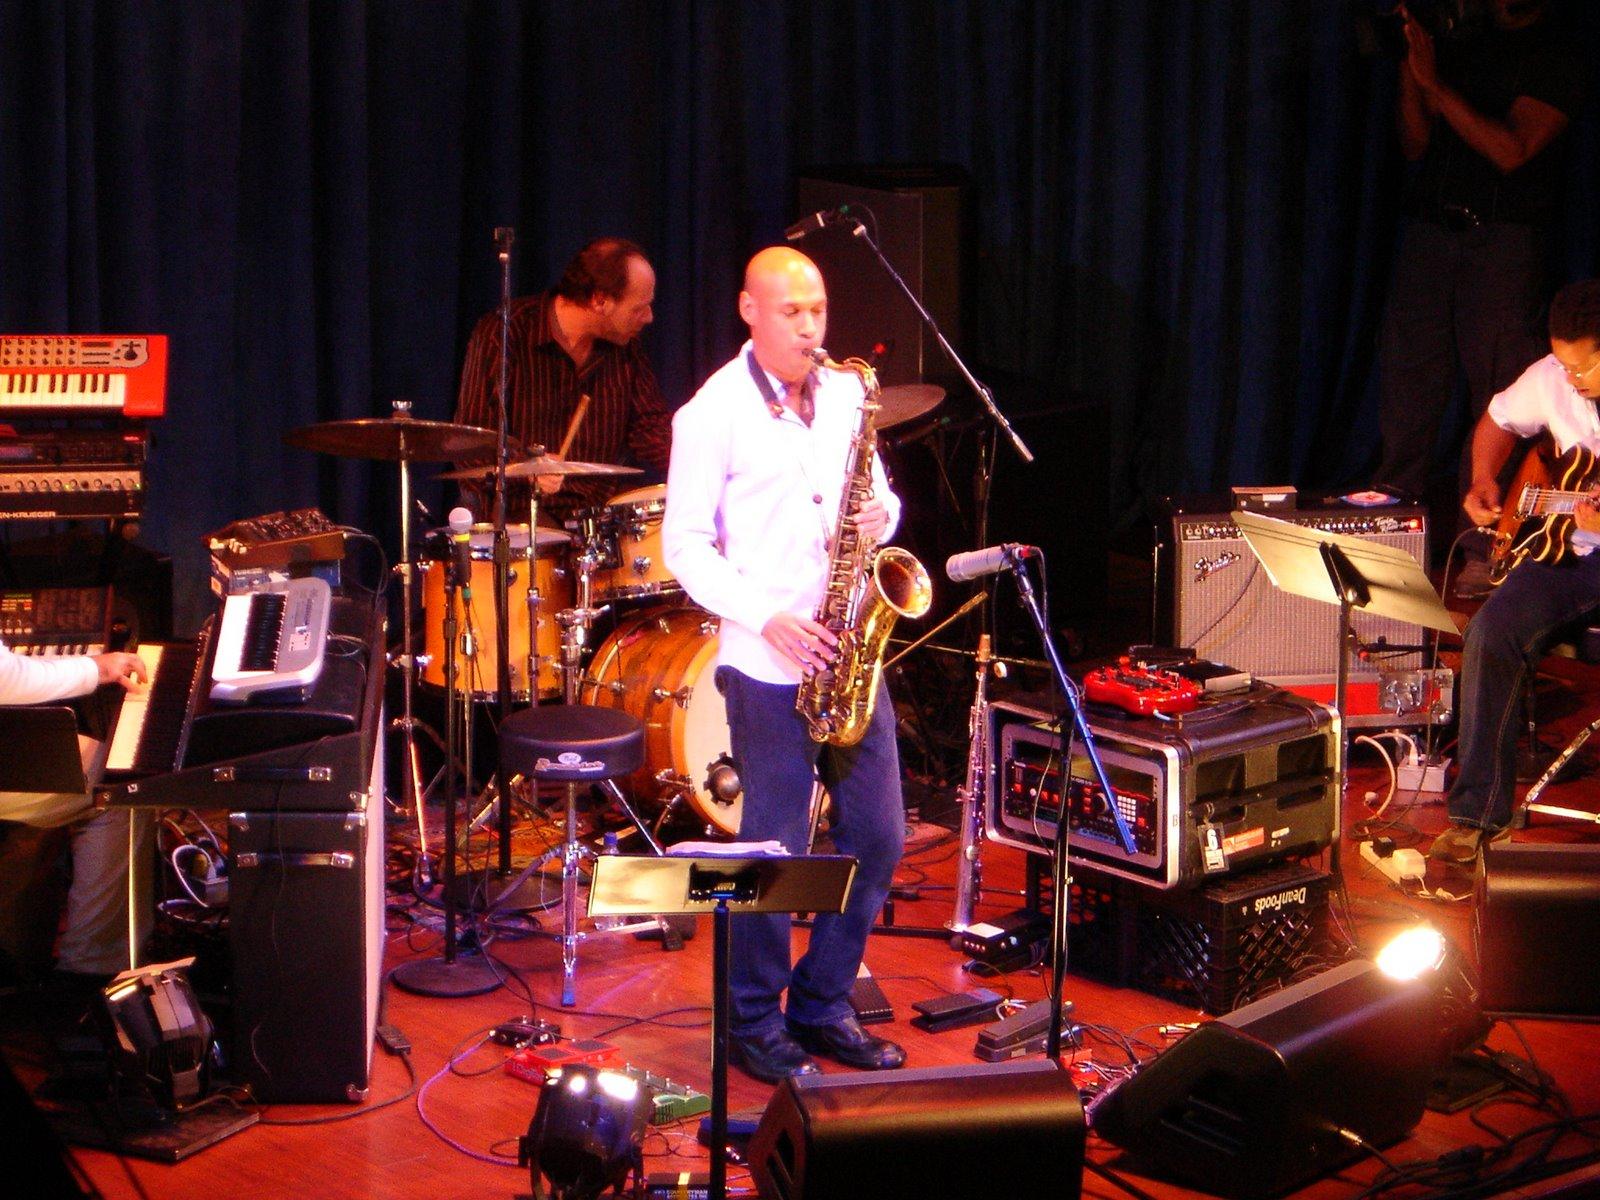 Captured local concerts like jazzman JOSHUA REDMAN